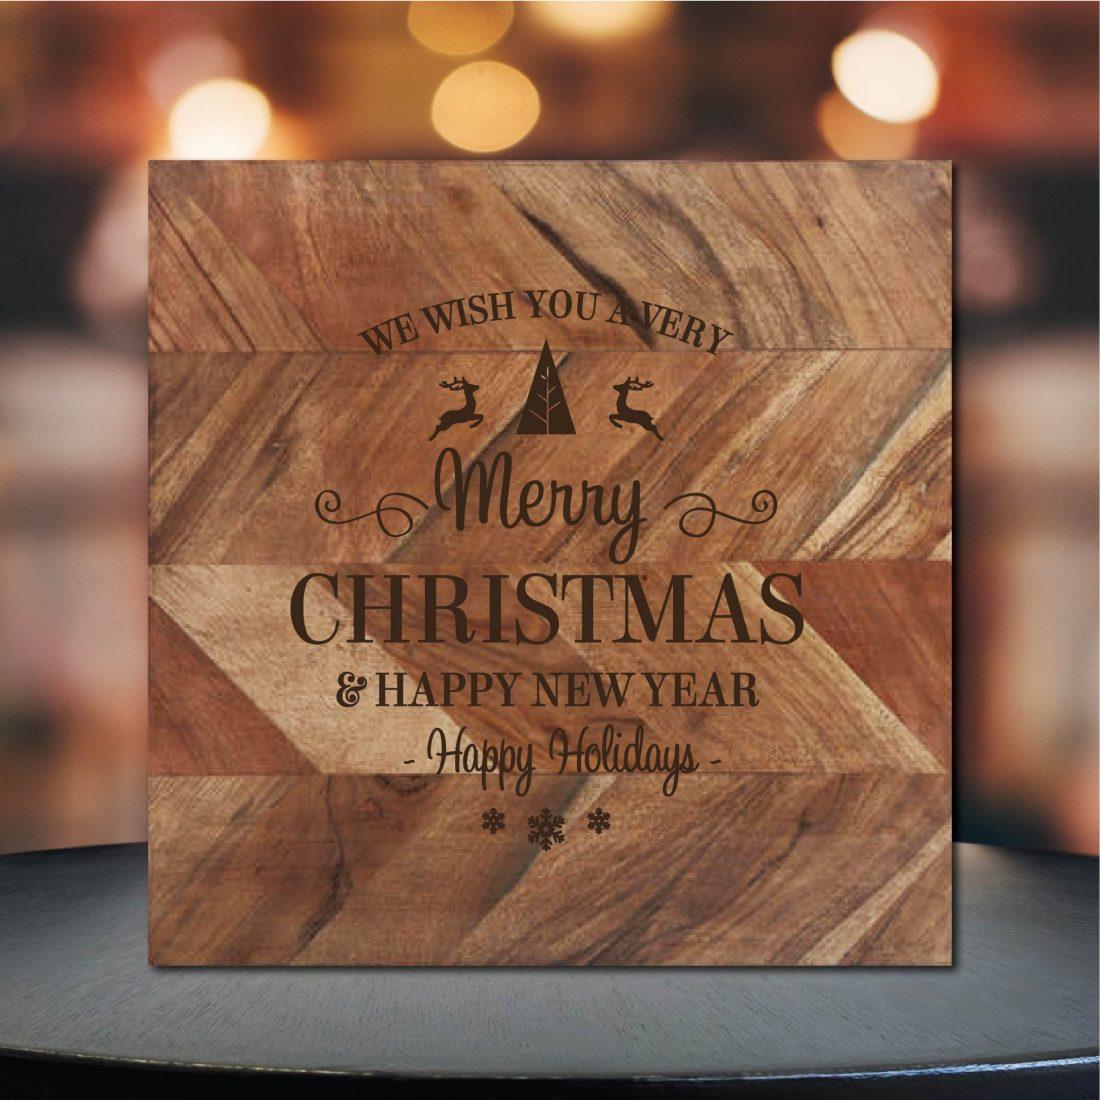 Merry ChristmasChopping Board